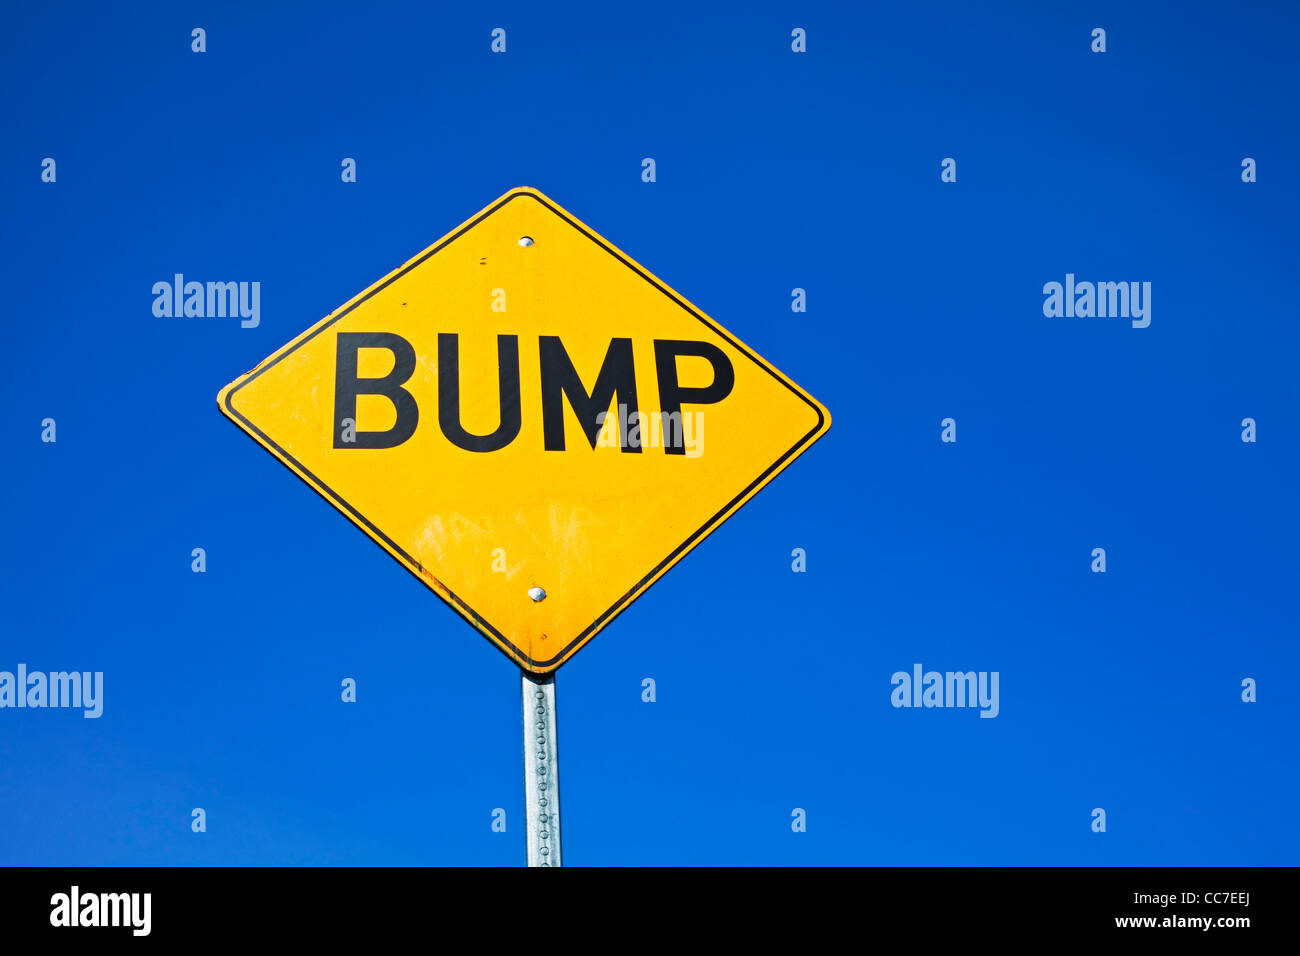 speed bump sign - Stock Image